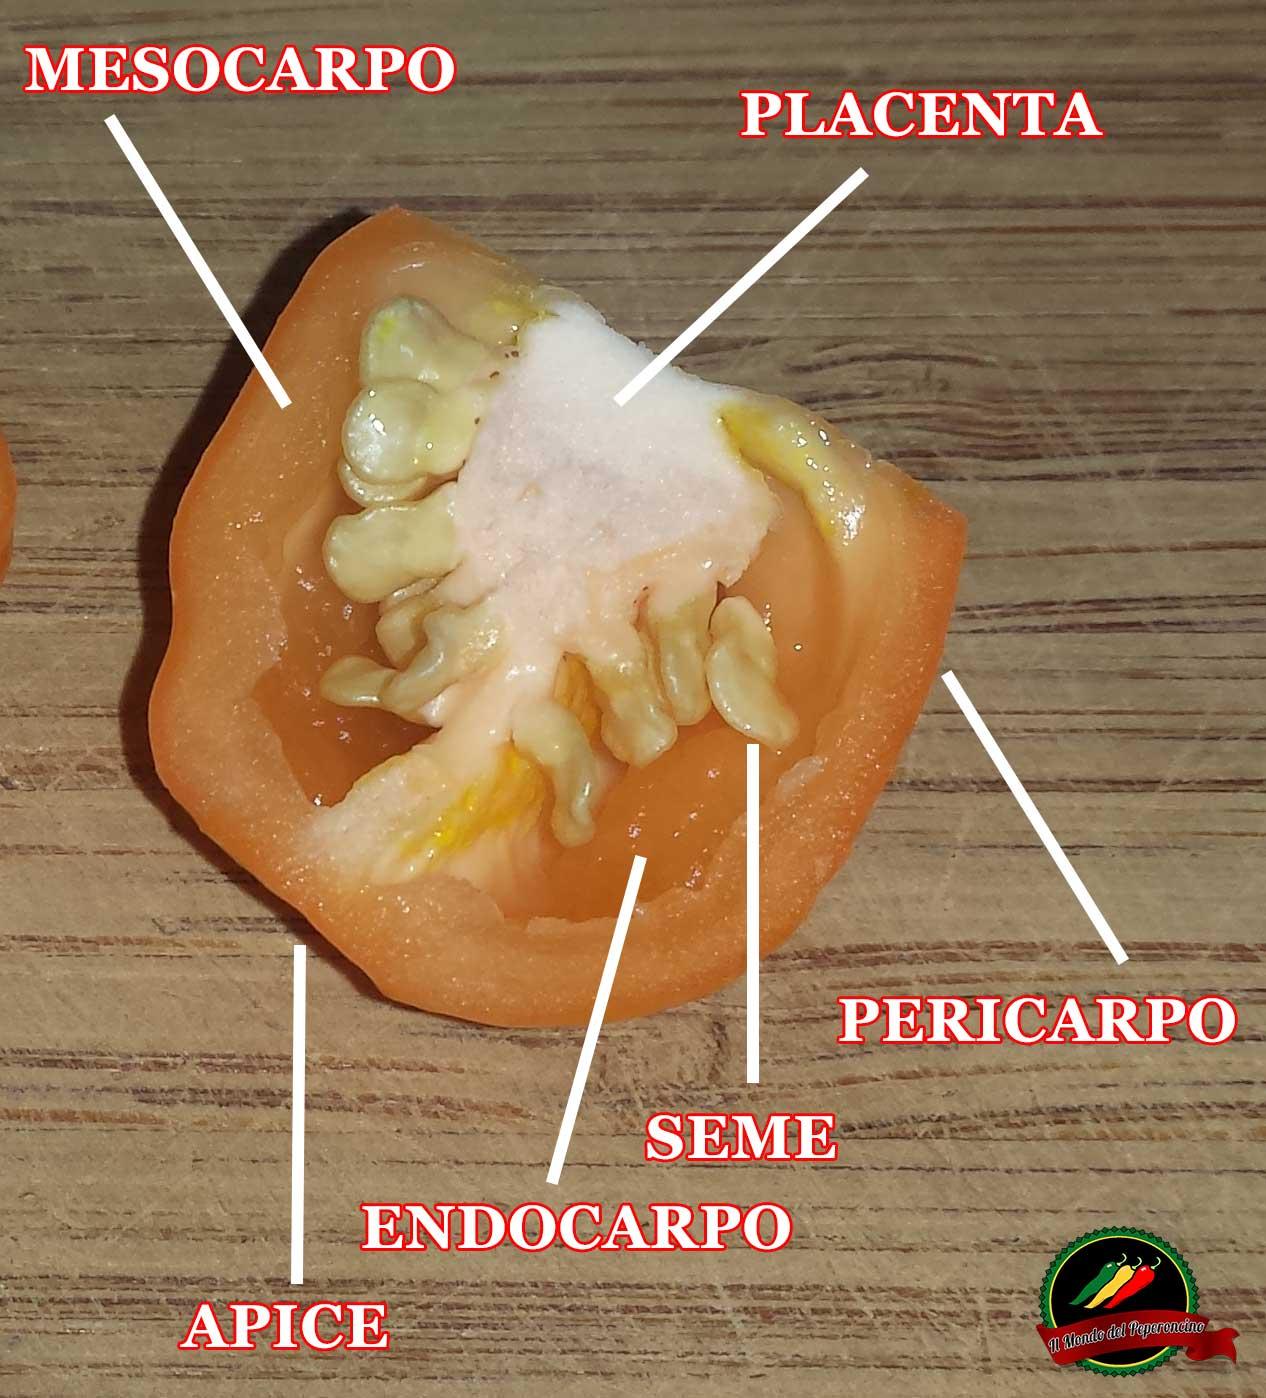 anatomia-peperoncino